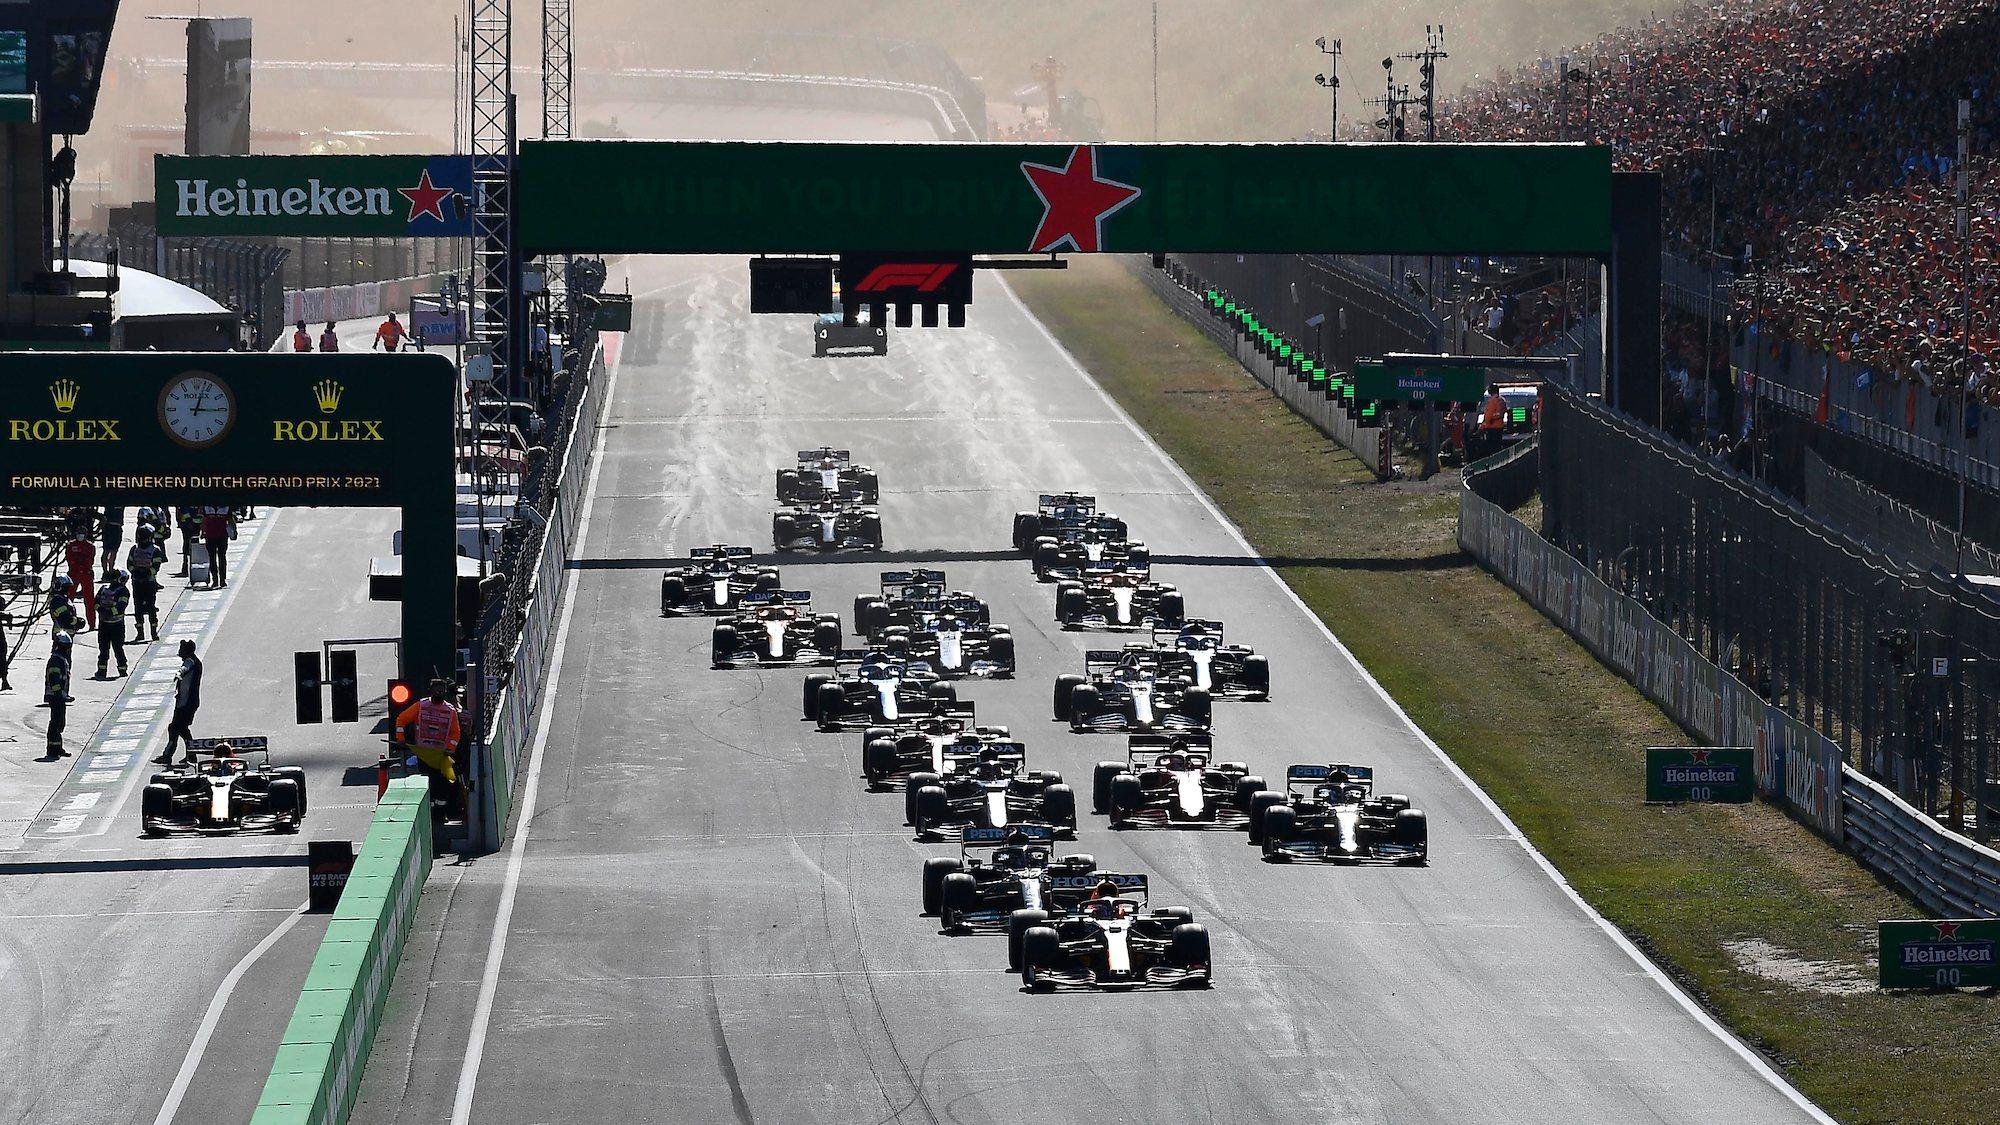 Dutch GP 2021 race start